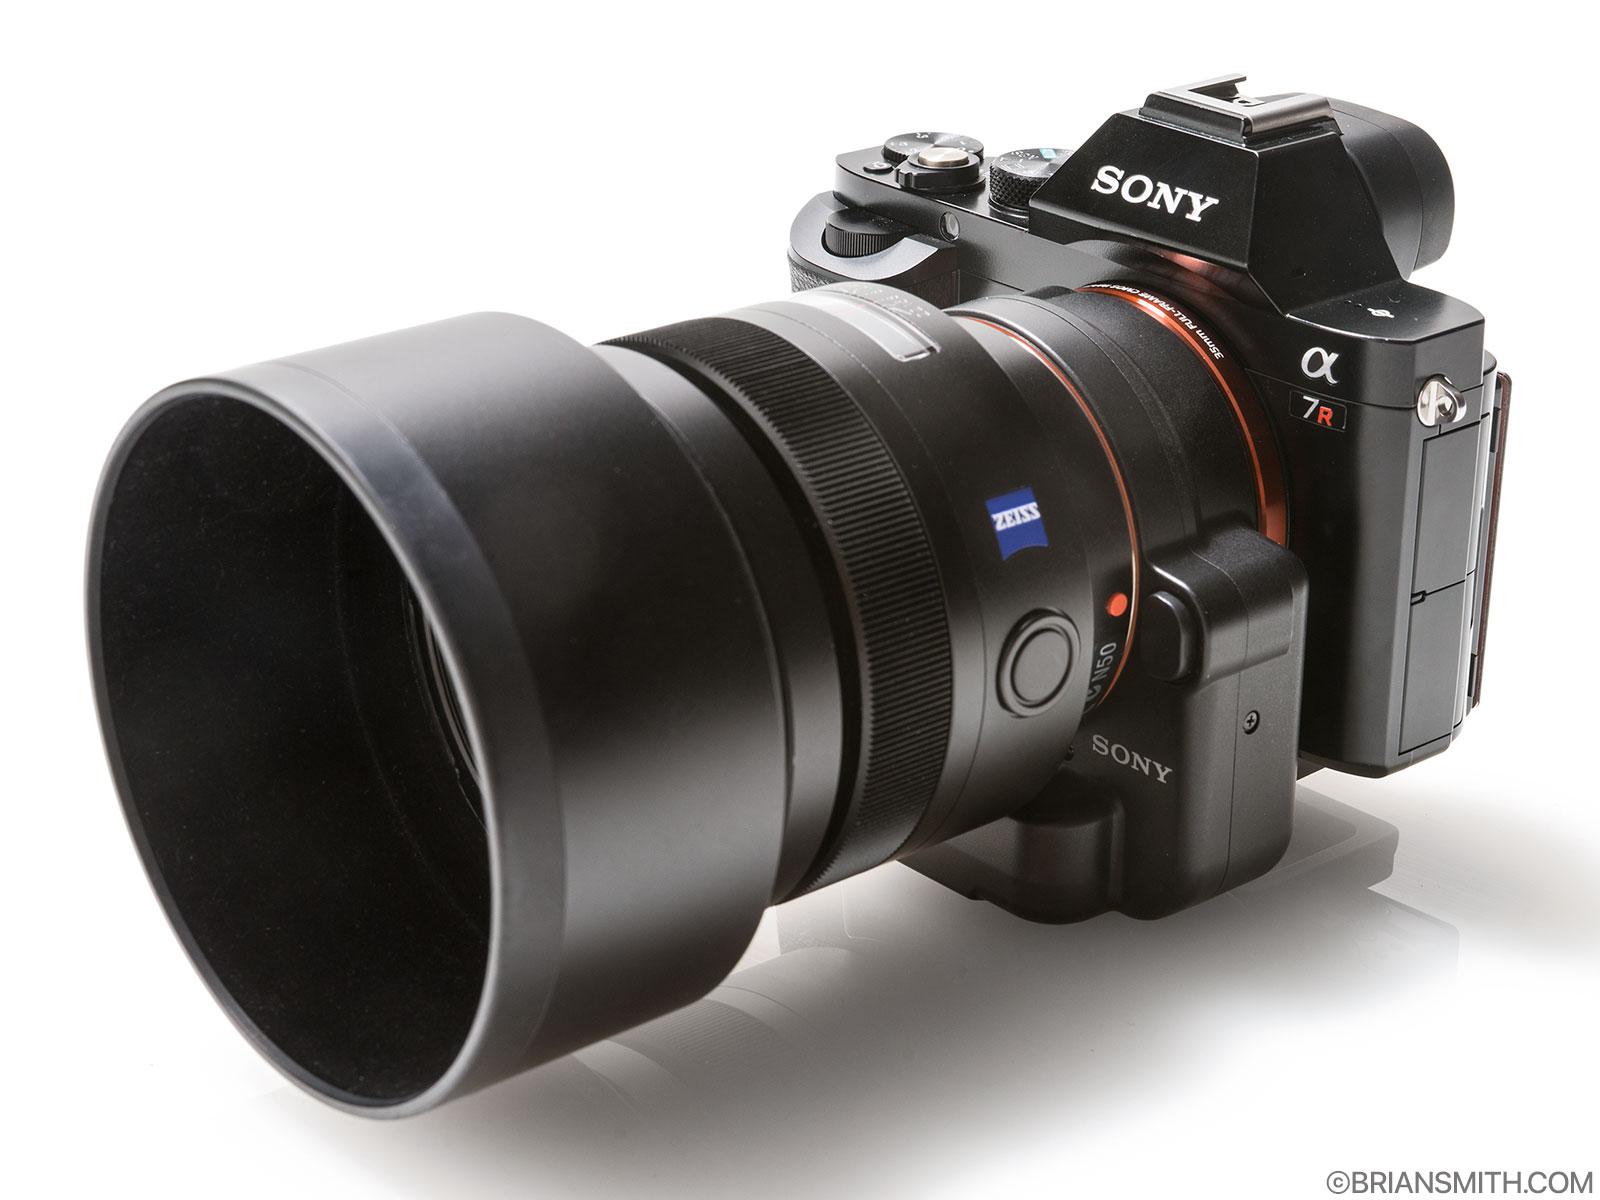 Sony a7R with LA-EA4 lens adapter an 85/1.4 ZA lens